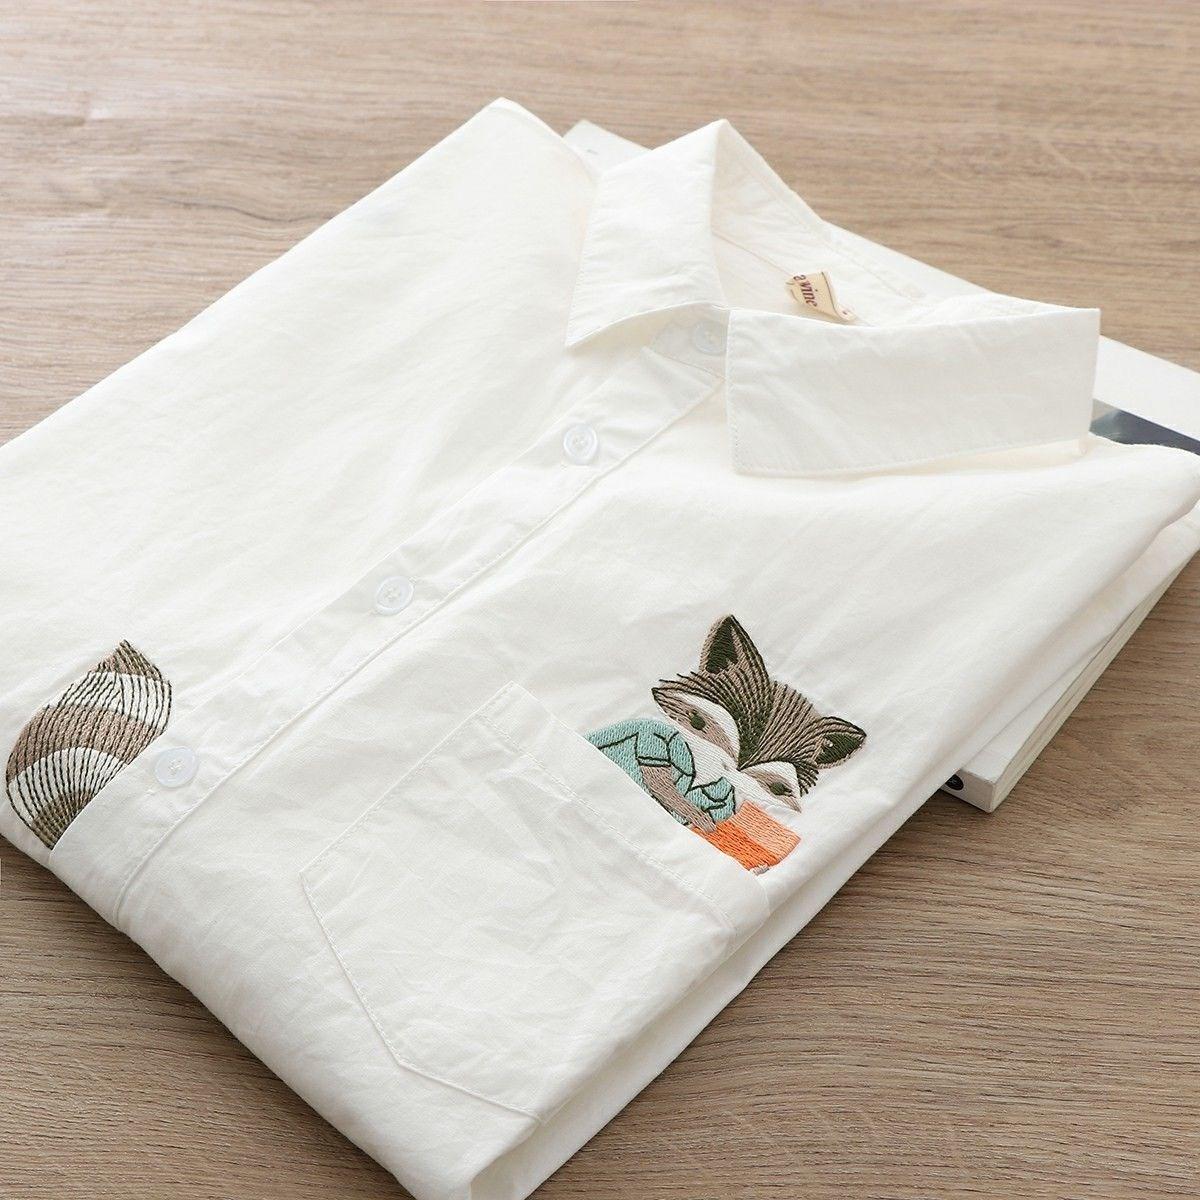 Другие вышивки Артикул 638686973414